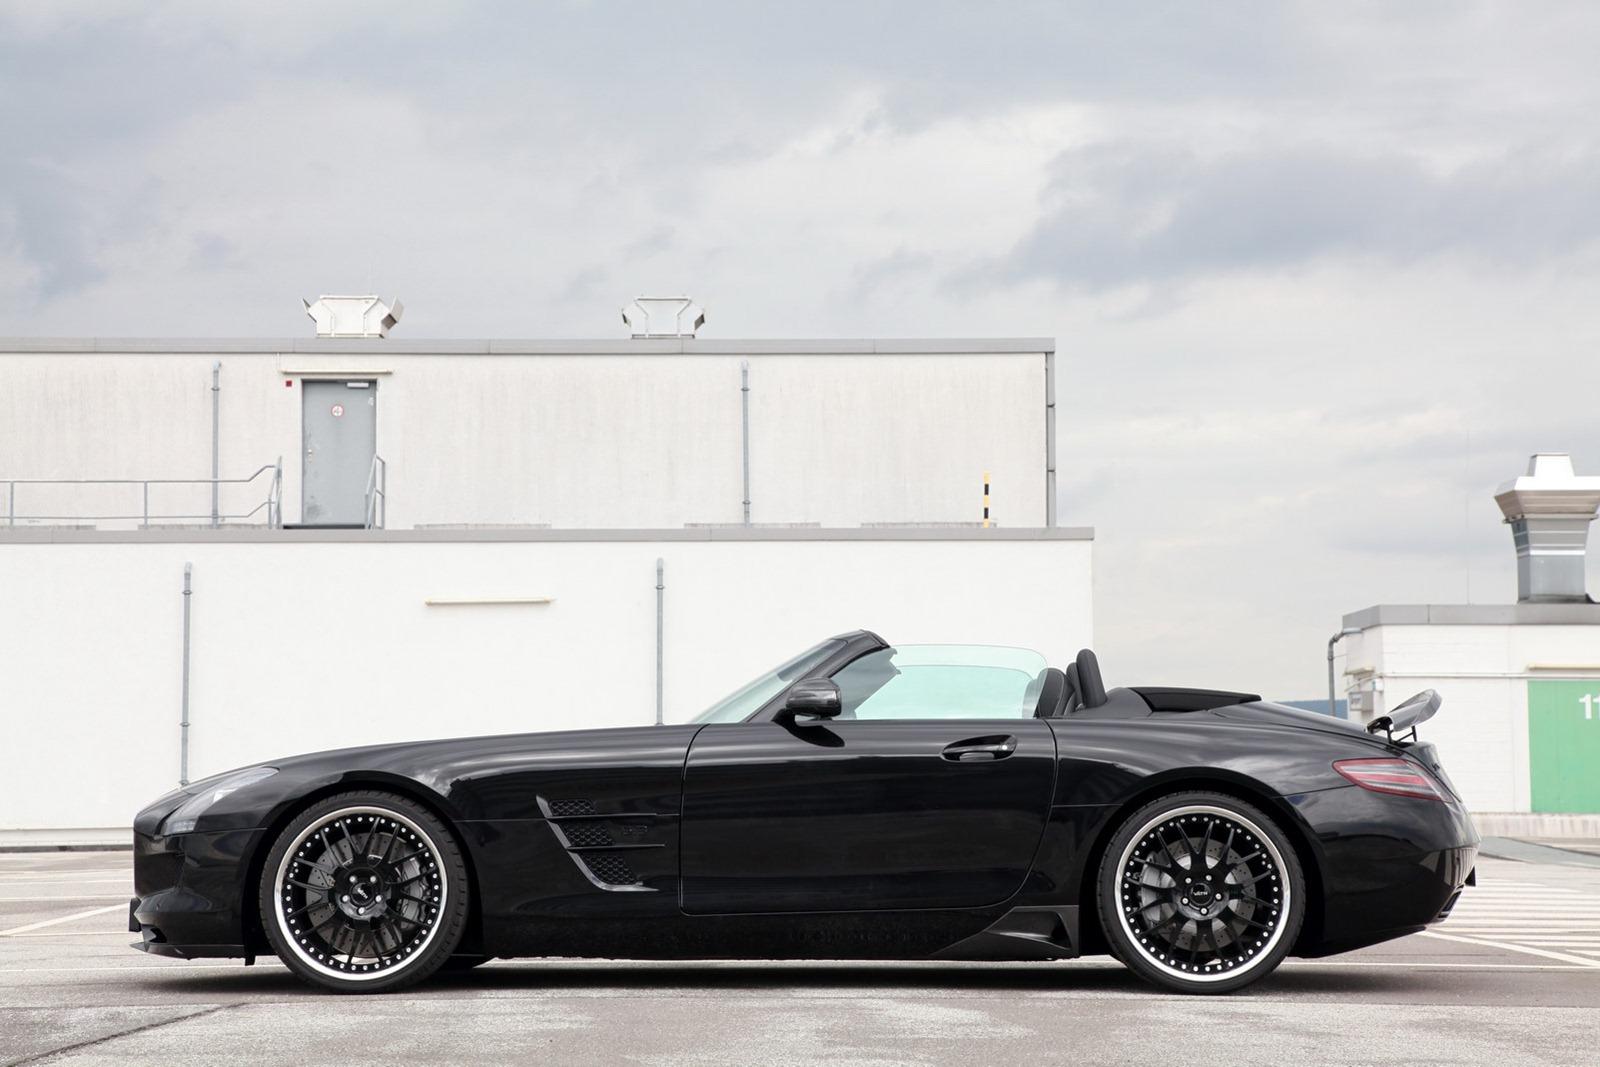 VATH SLS AMG Roadster